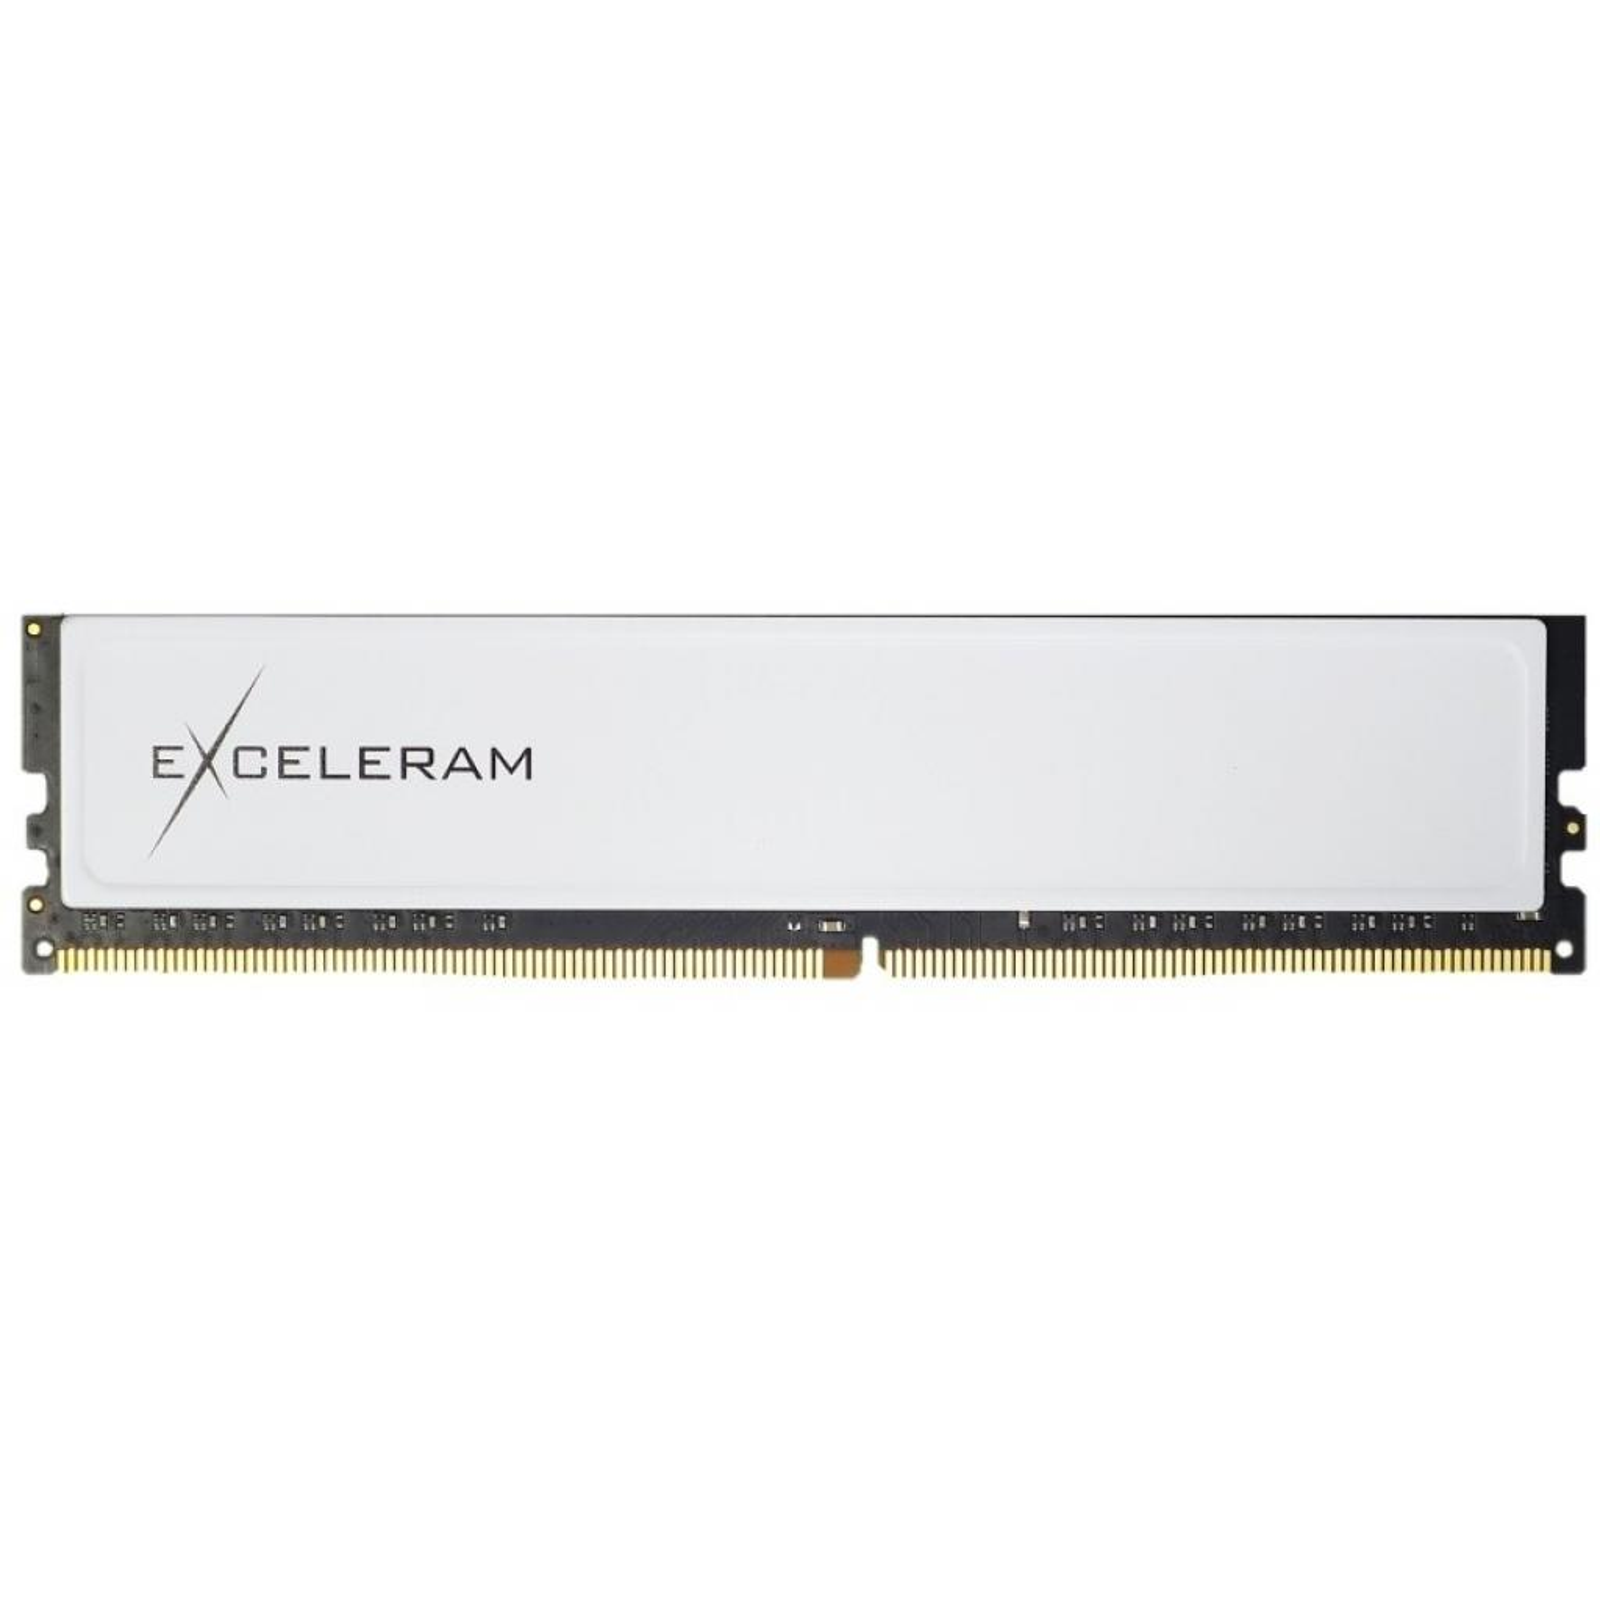 Модуль памяти для компьютера DDR4 16GB 2666 MHz Black&White eXceleram (EBW4162619C)